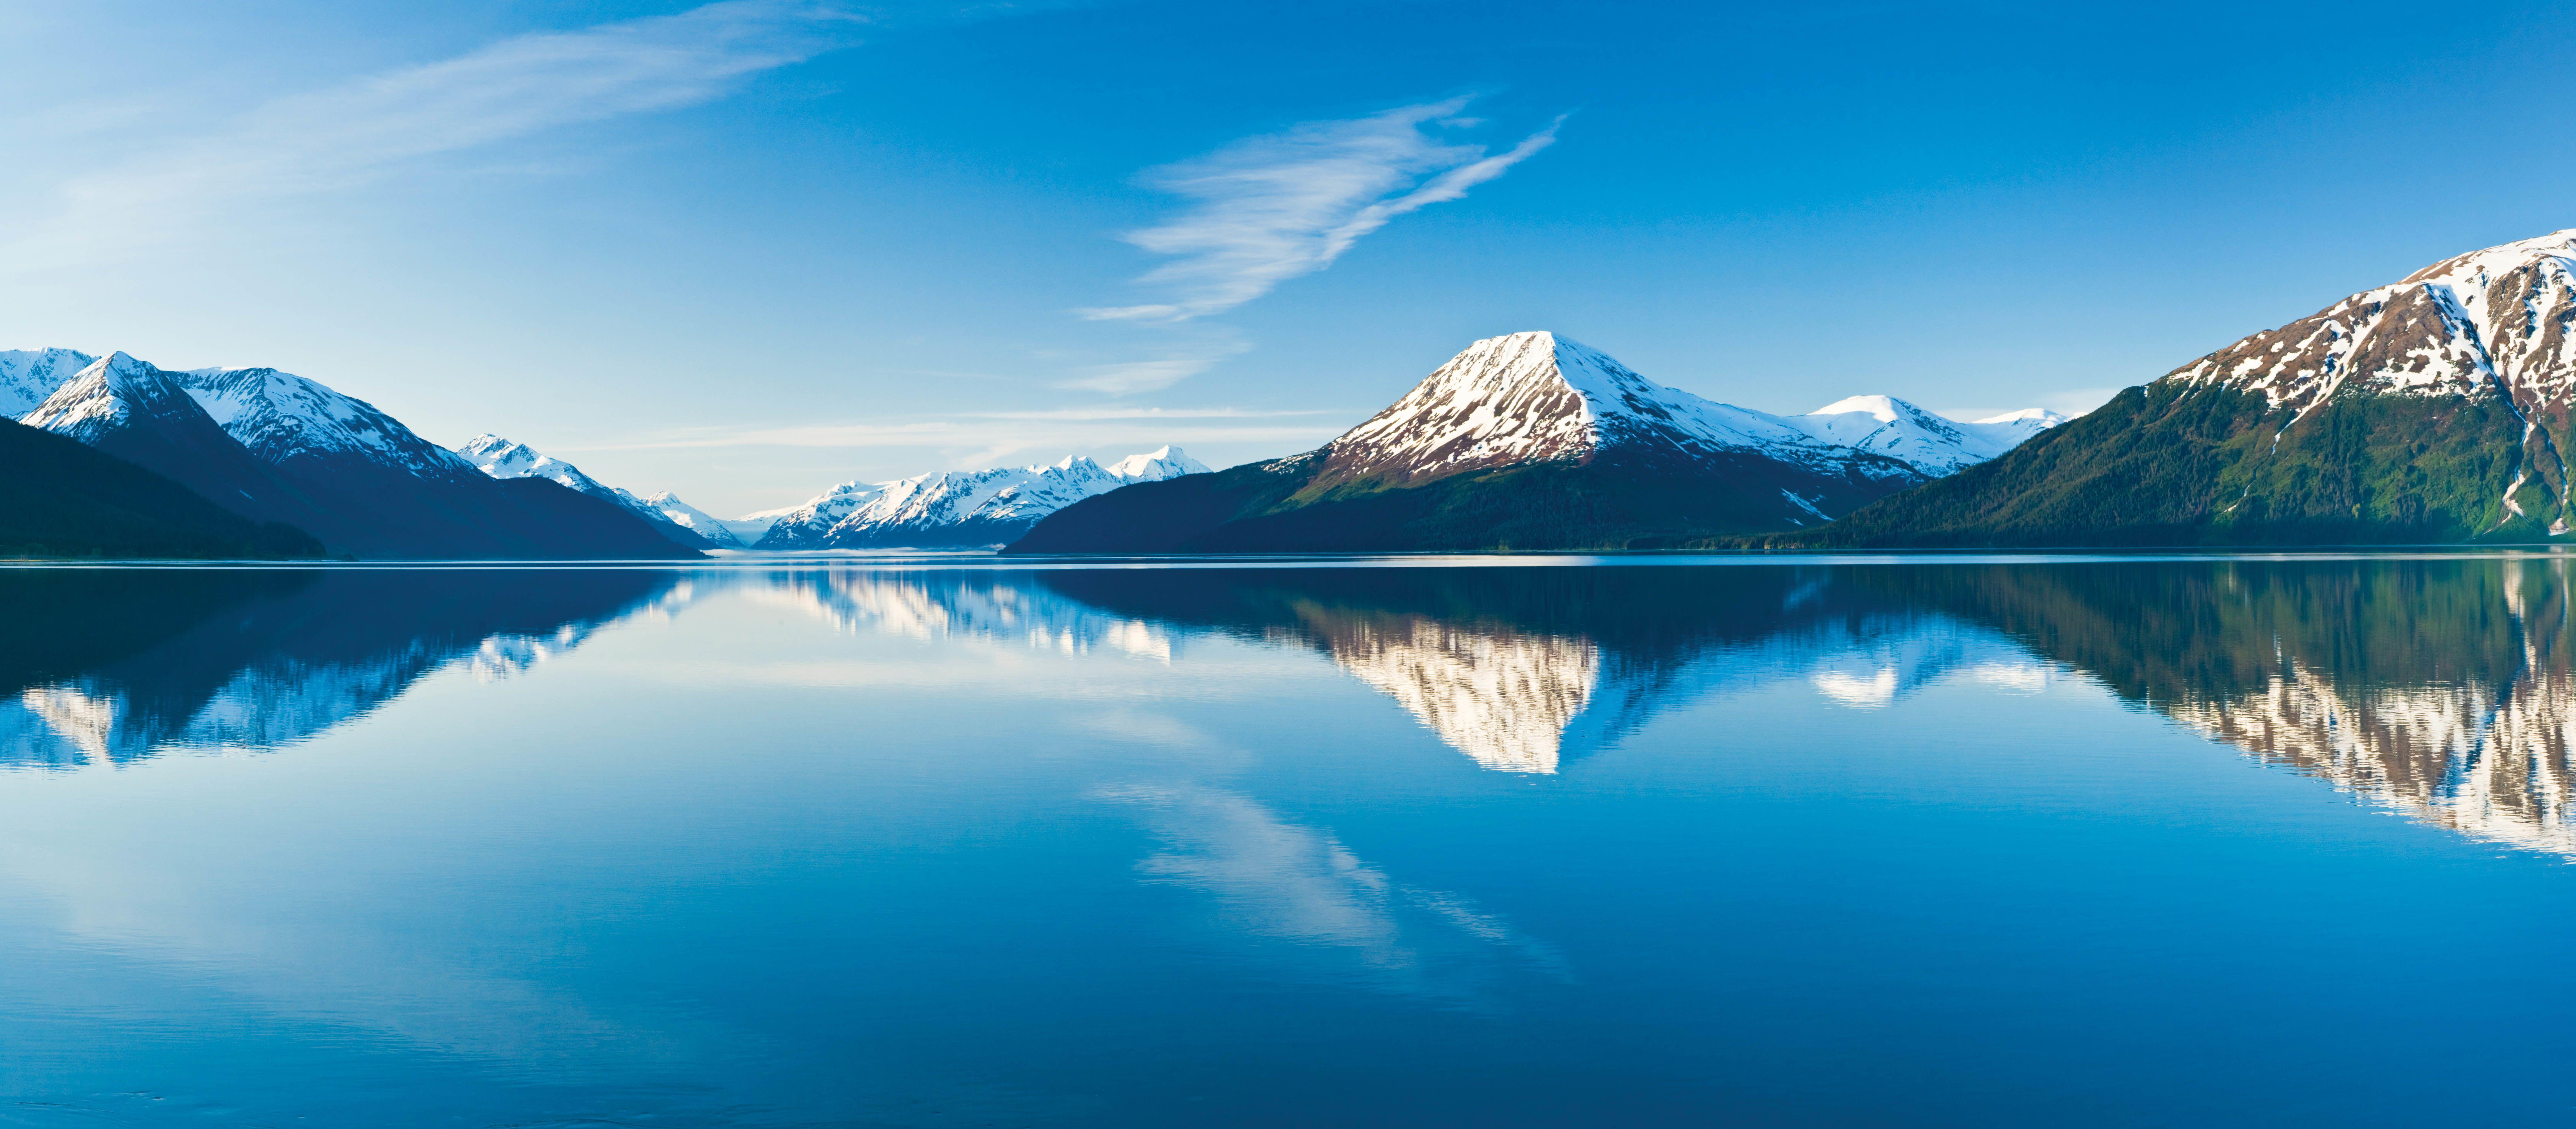 Kenai Mountains in Alaska